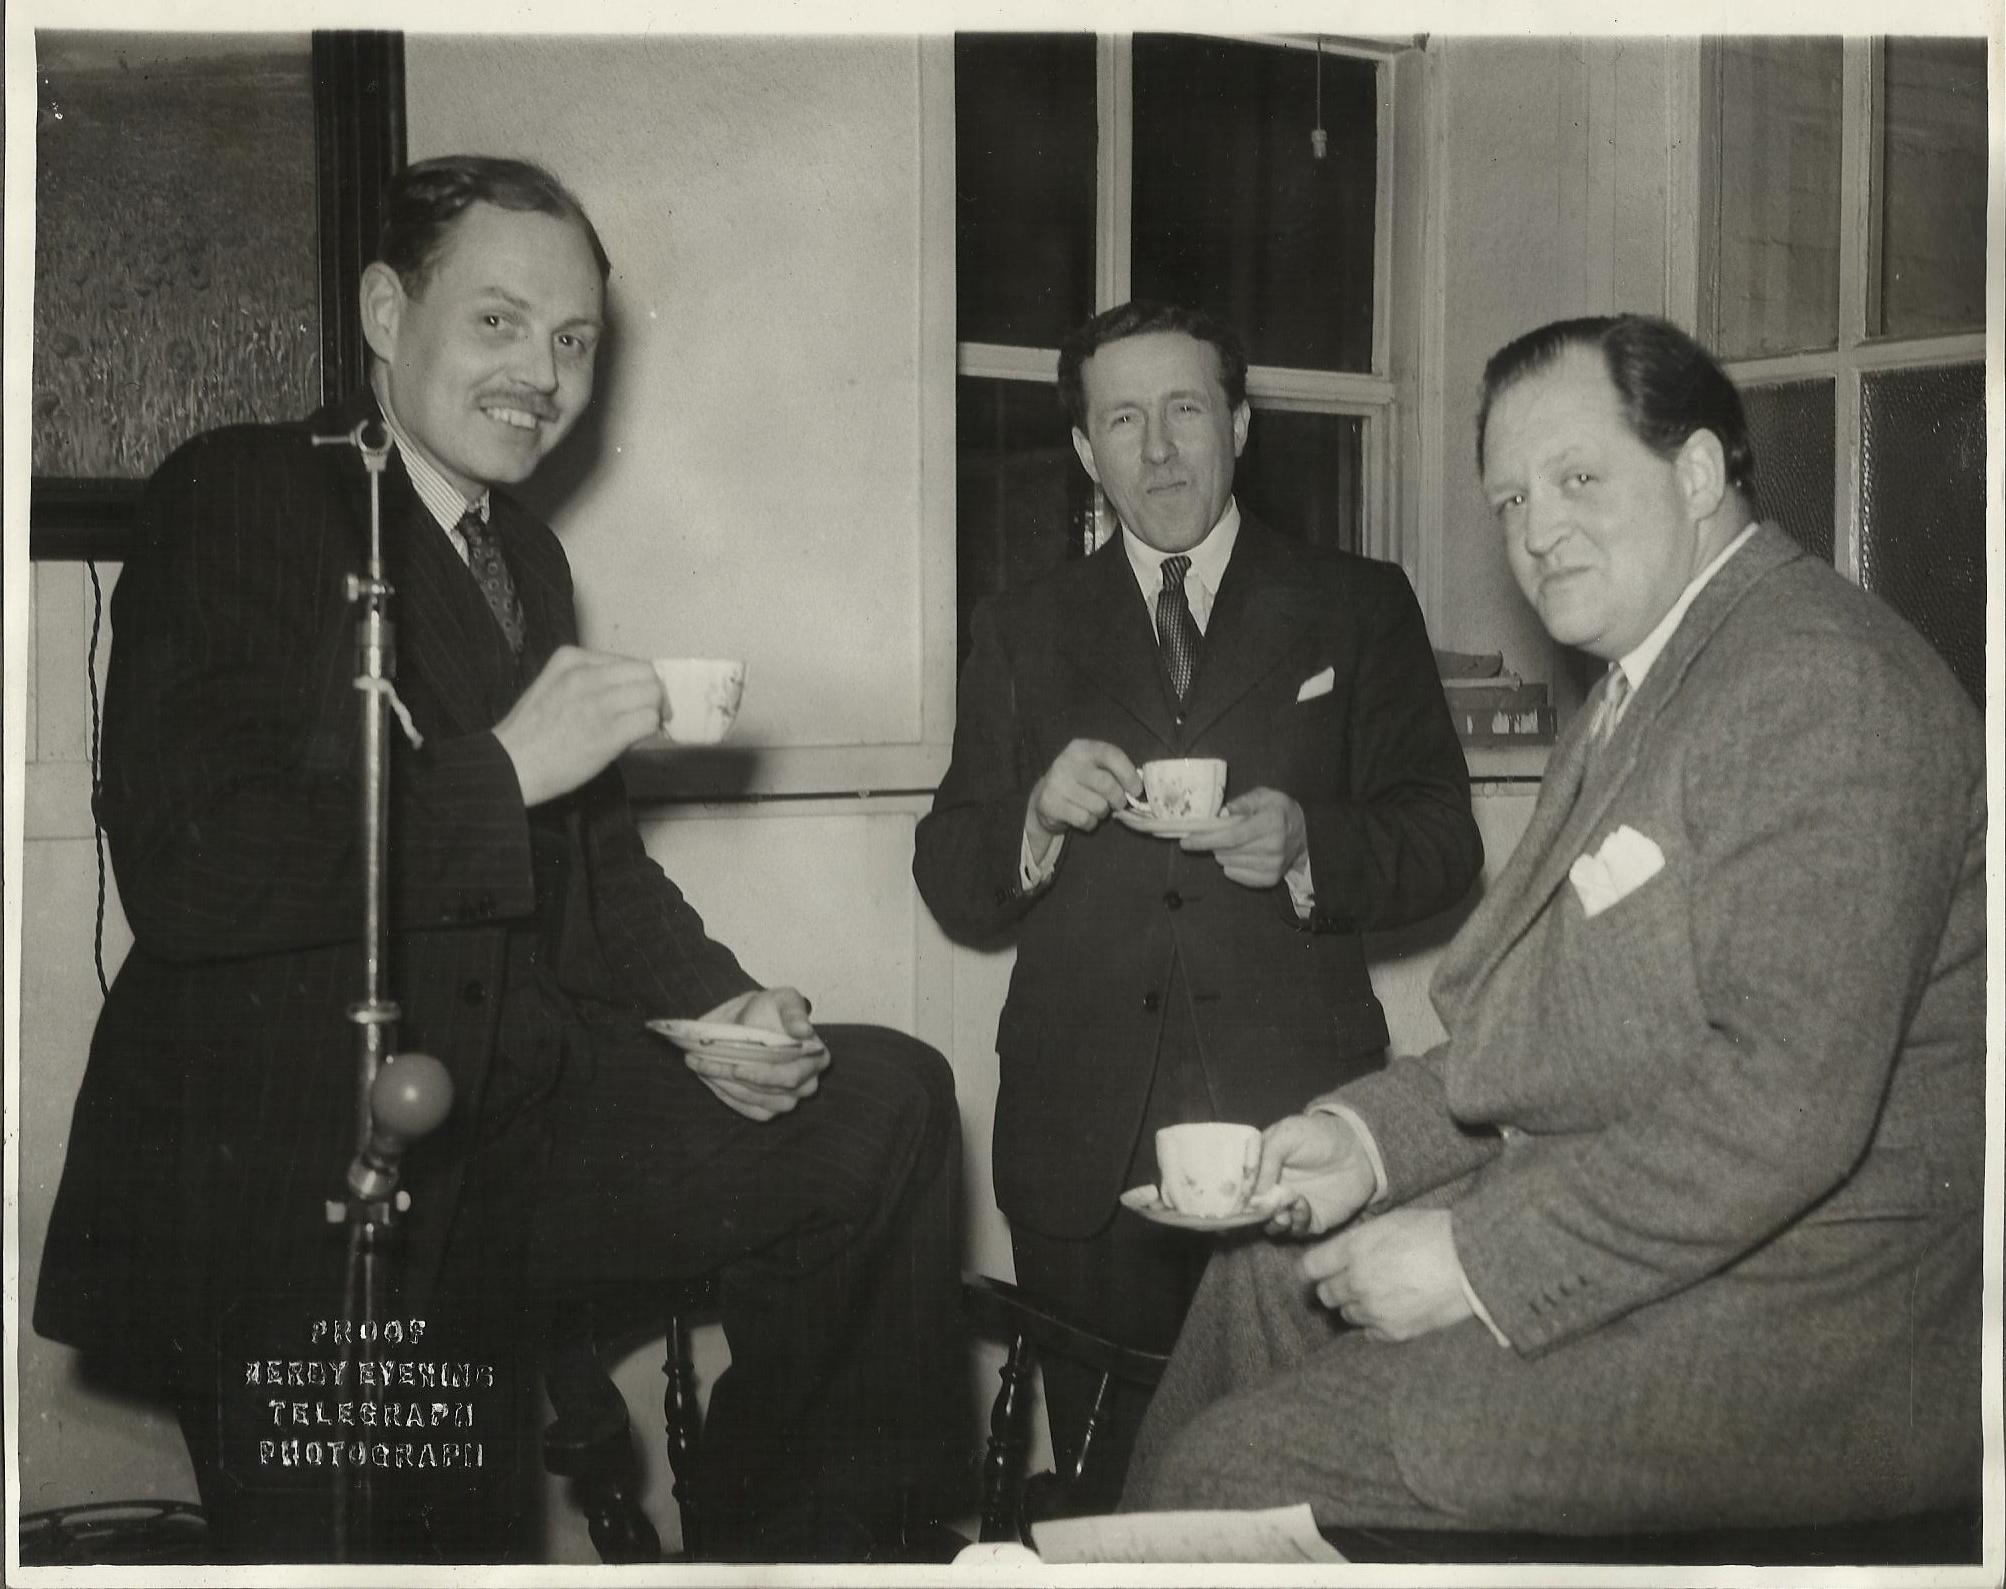 royal-crown-derby-richard-dimbleby-philip-robinson-colin-osborne-march-1950